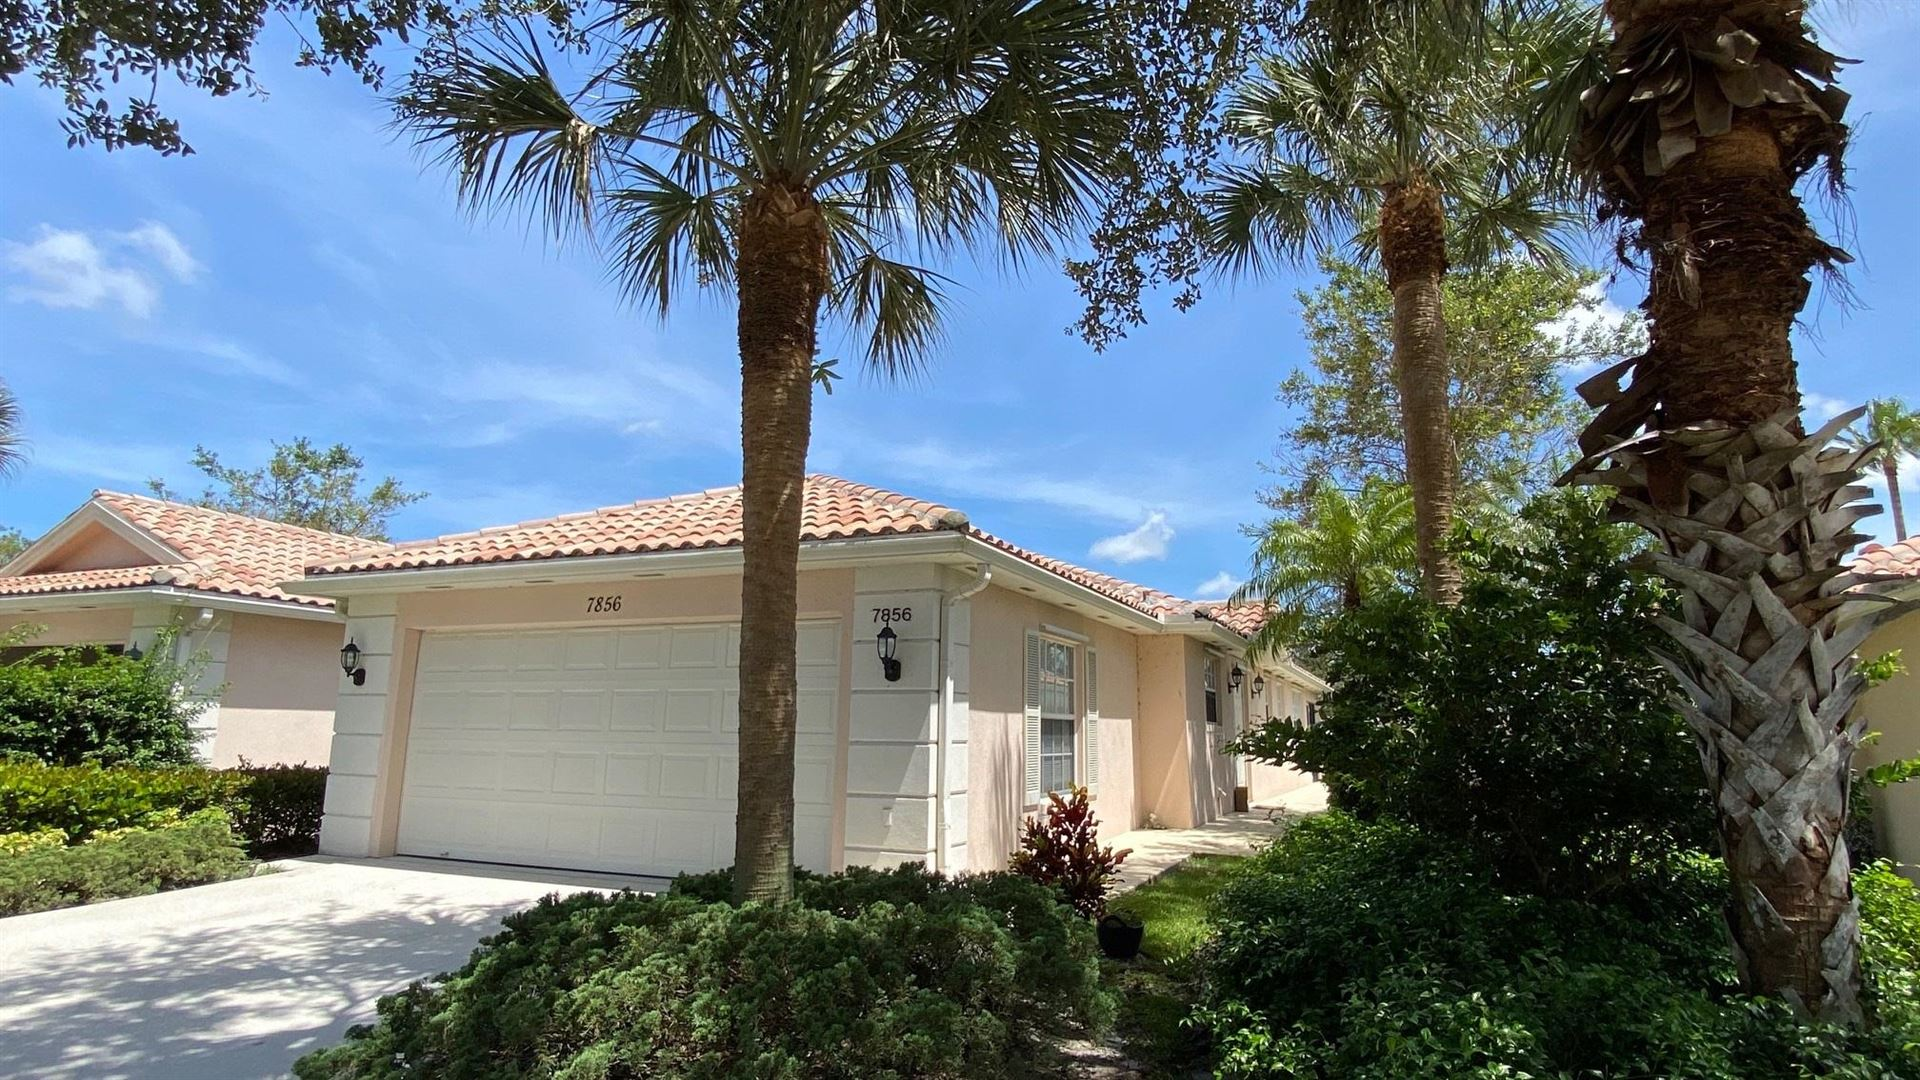 7856 Olympia Drive #7856, West Palm Beach, FL 33411 - #: RX-10639688